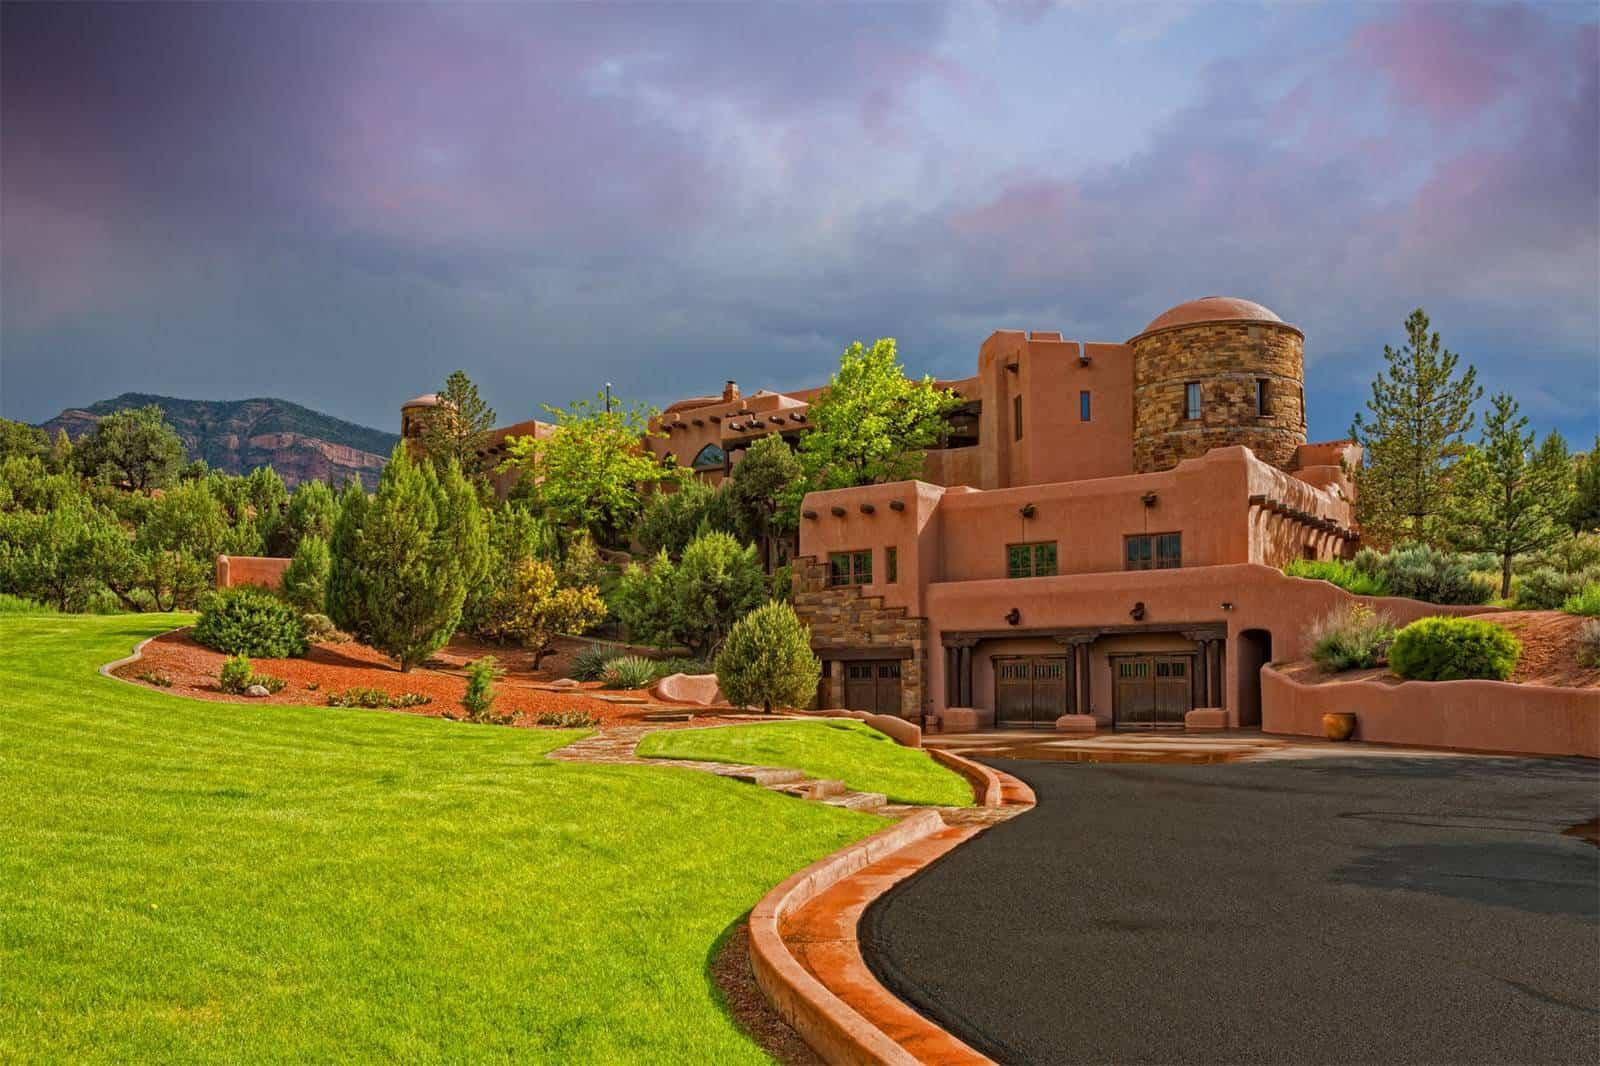 Gateway Canyons Ranches & Resort 3